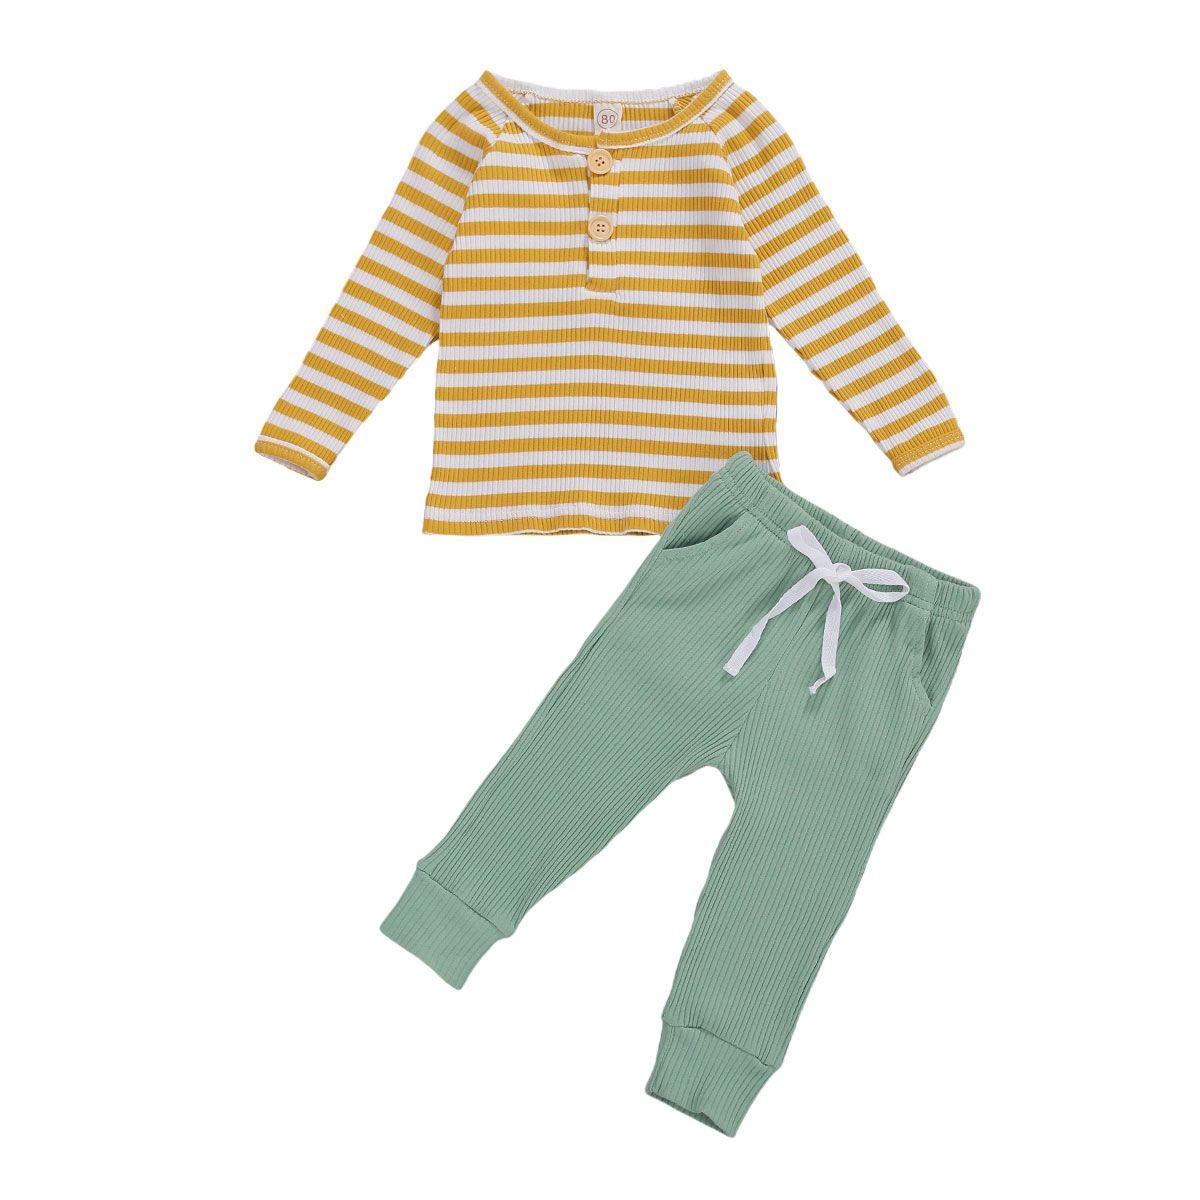 Neue Baby Mädchen Streifen Oansatz Hohe Taille Outfits Mädchen Langarm T-shirts Kinder Tops Hosen Set Frühling 2pcs / set